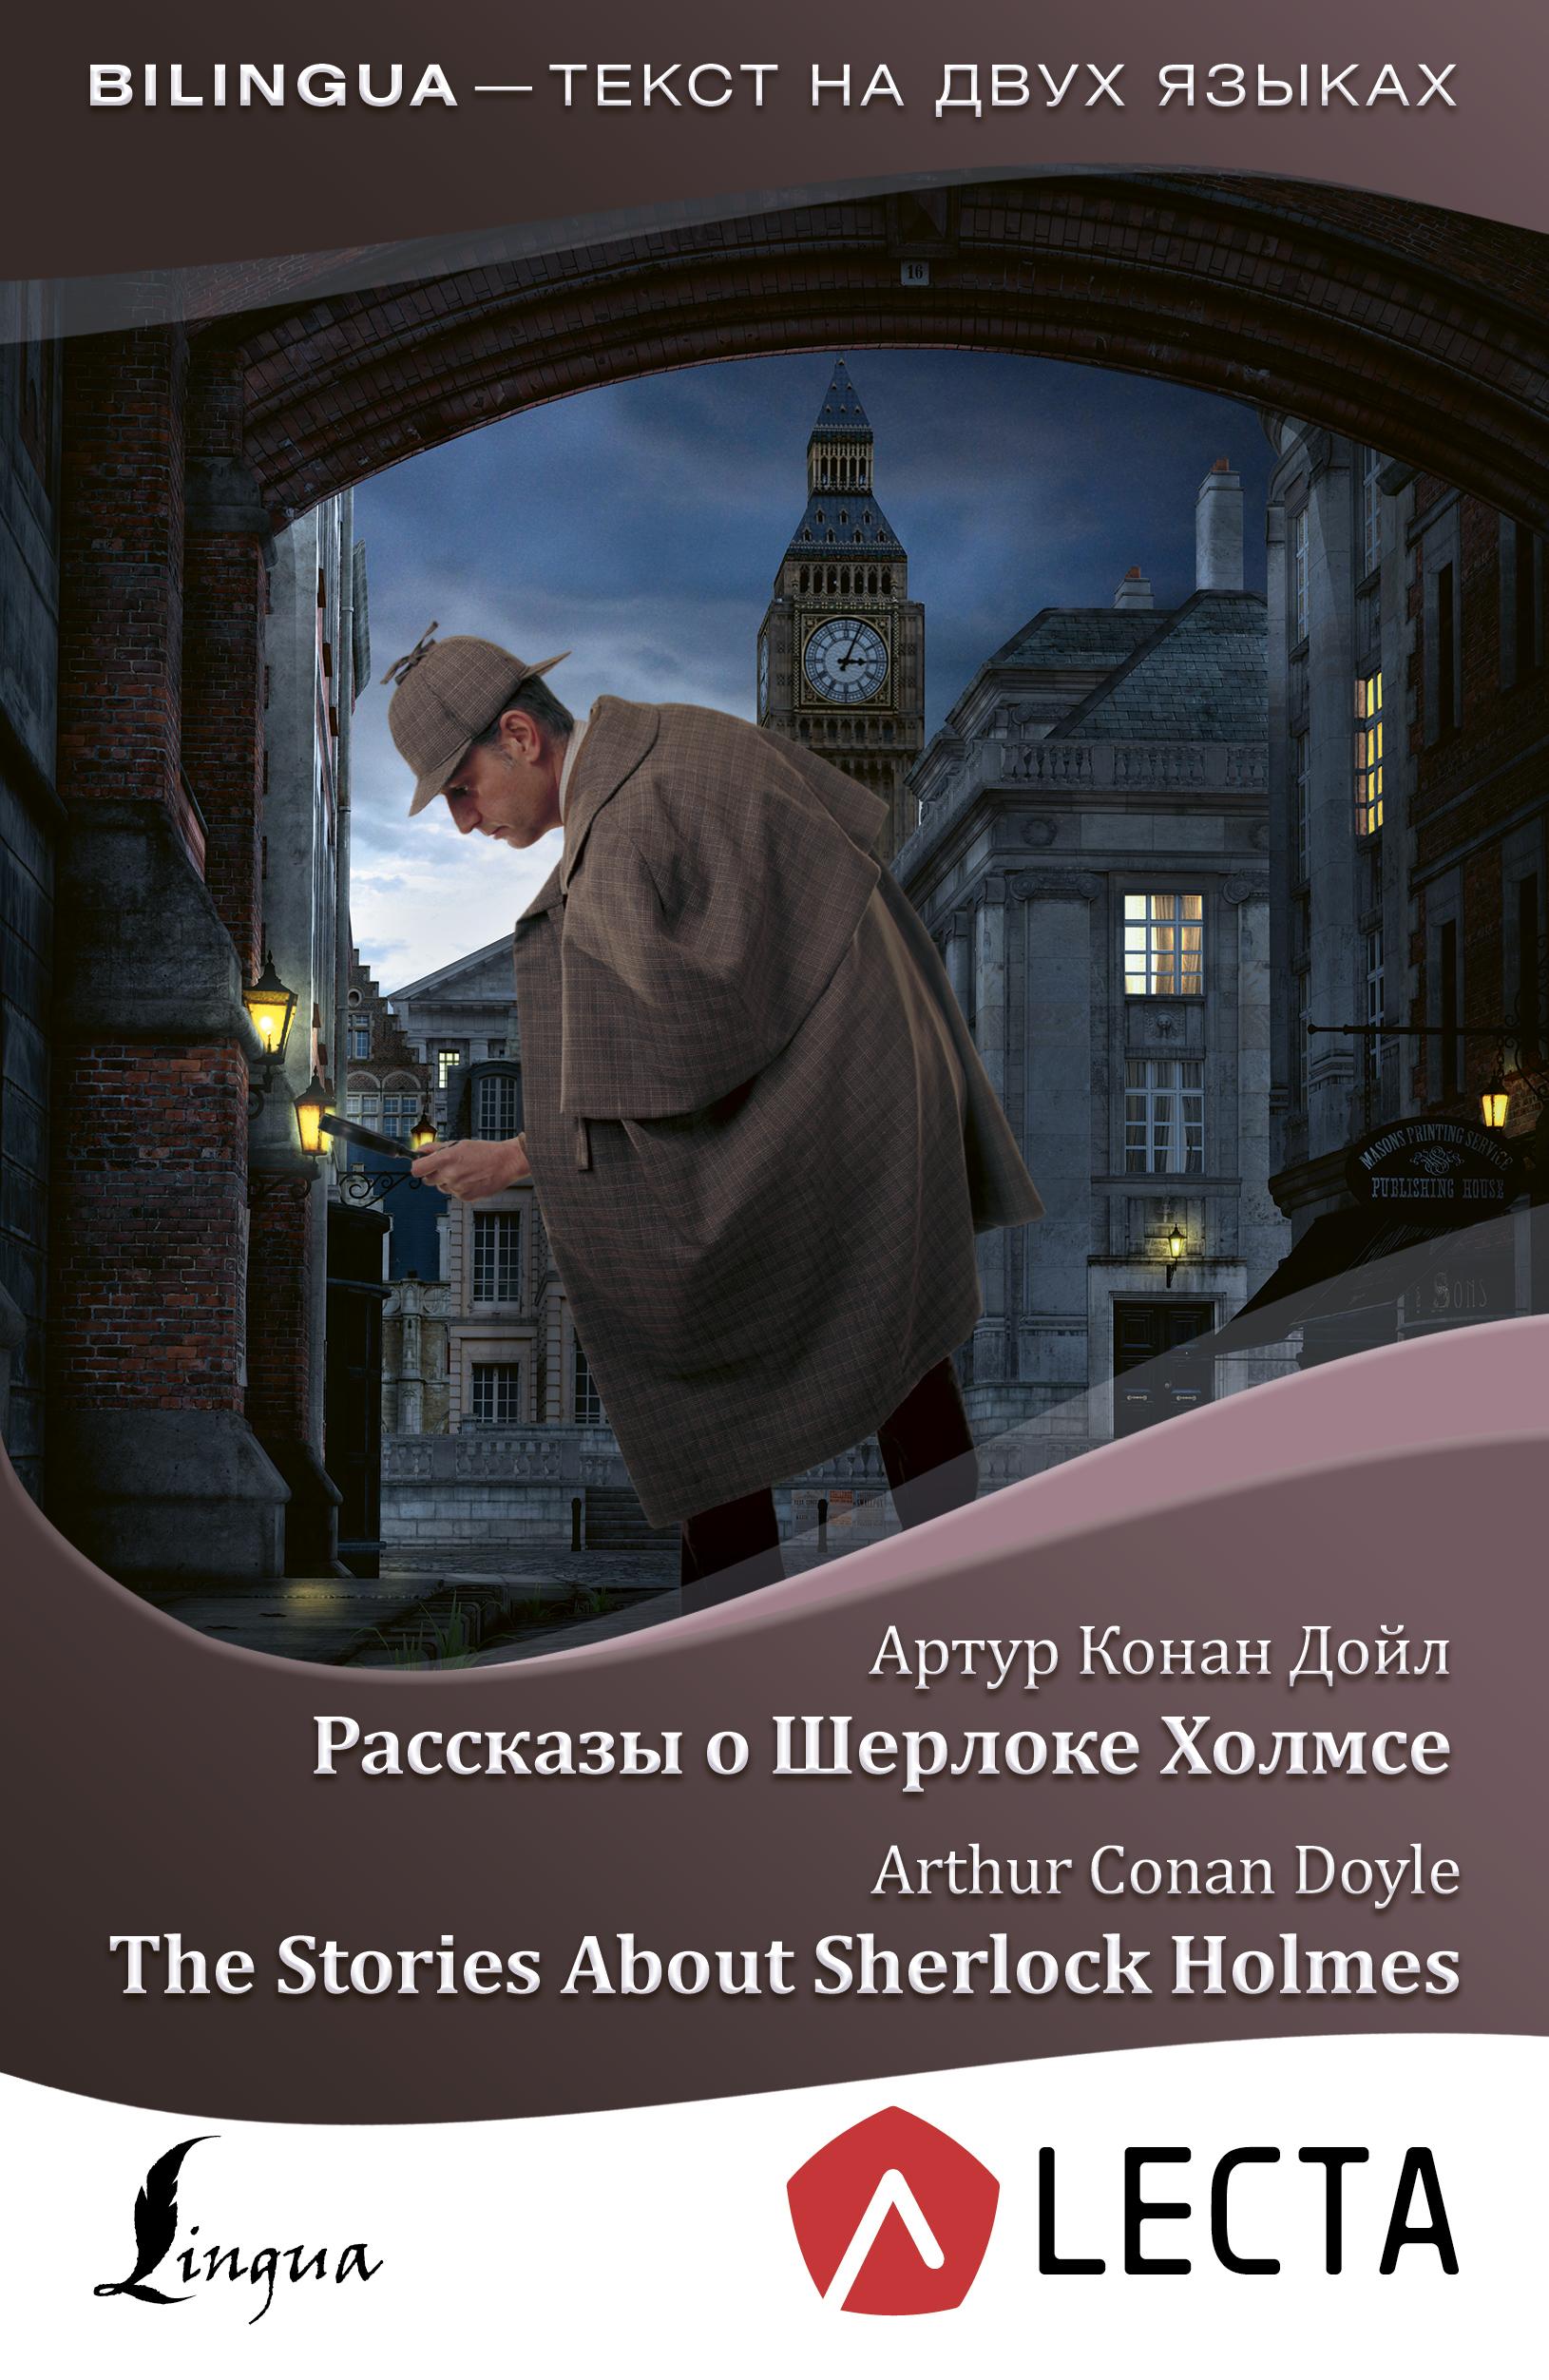 Рассказы о Шерлоке Холмсе = The Stories About Sherlock Holmes + аудиоприложение LECTA ( Дойл Артур Конан  )